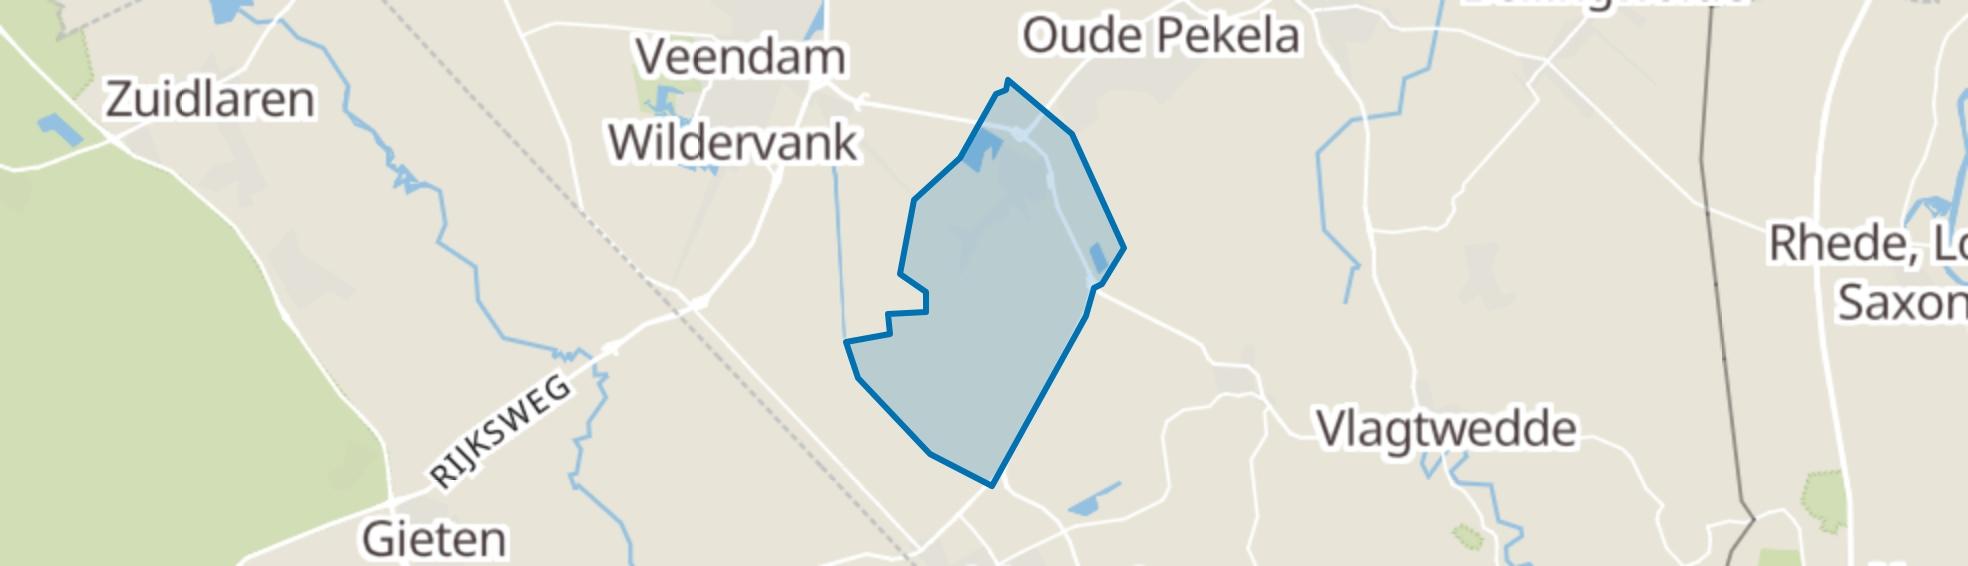 Nieuwe Pekela map